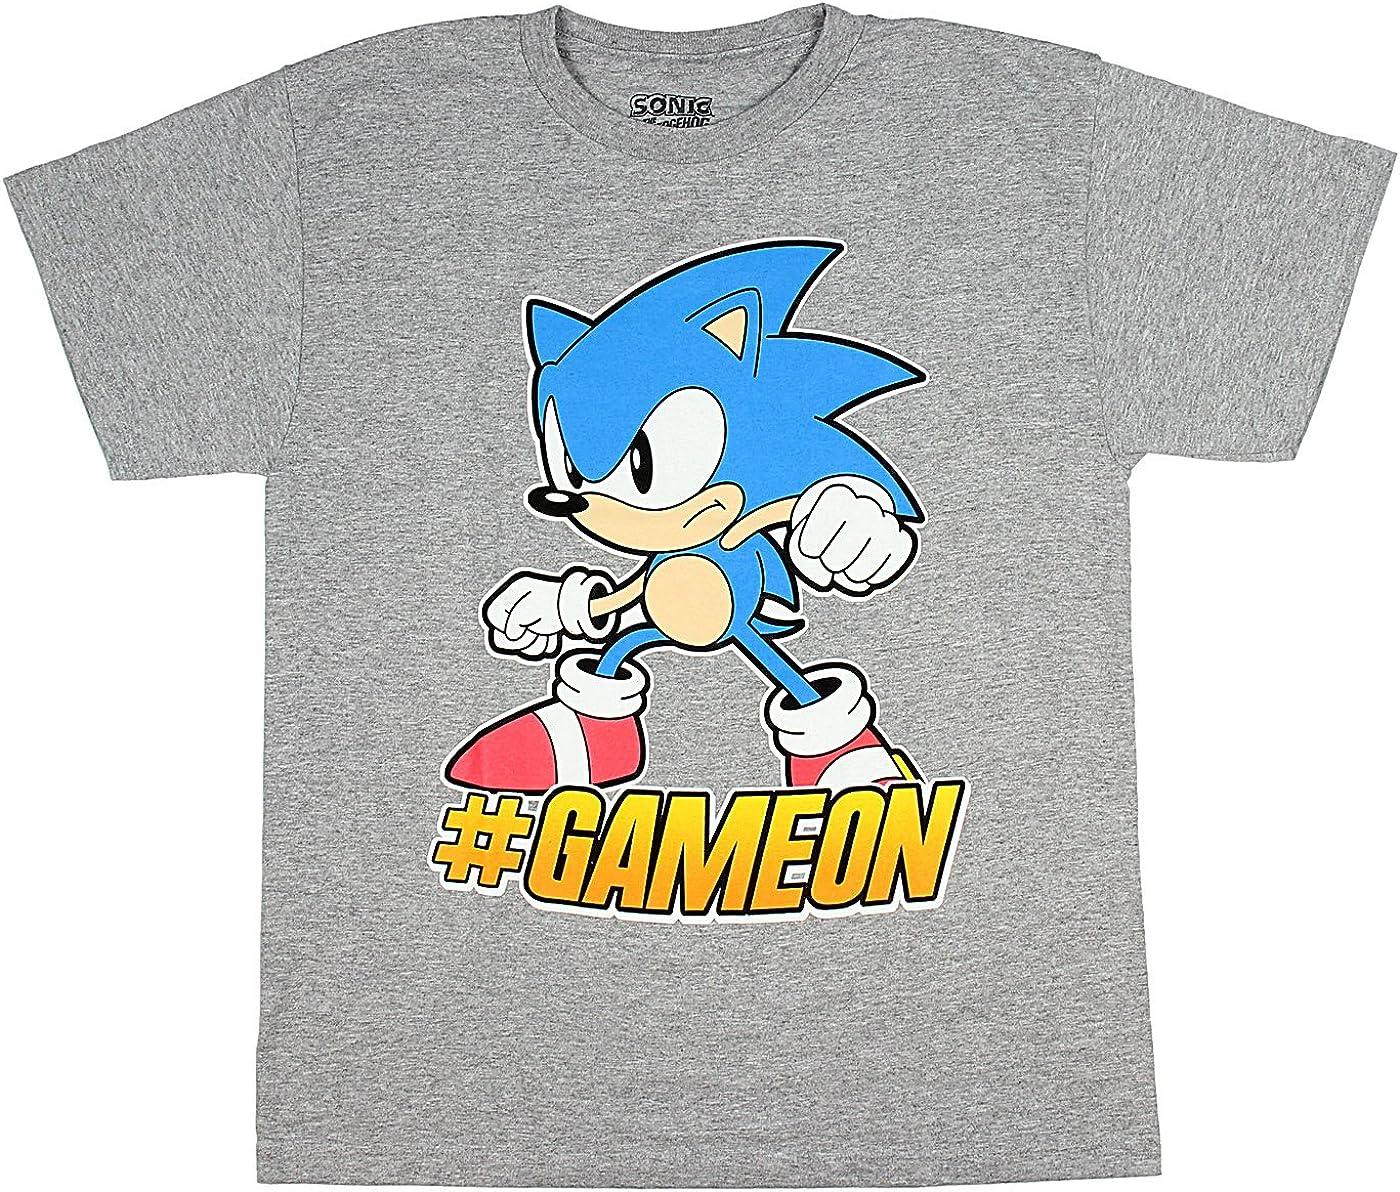 Sonic The Hedgehog #GameOn Sega Video Game Boys T-Shirt